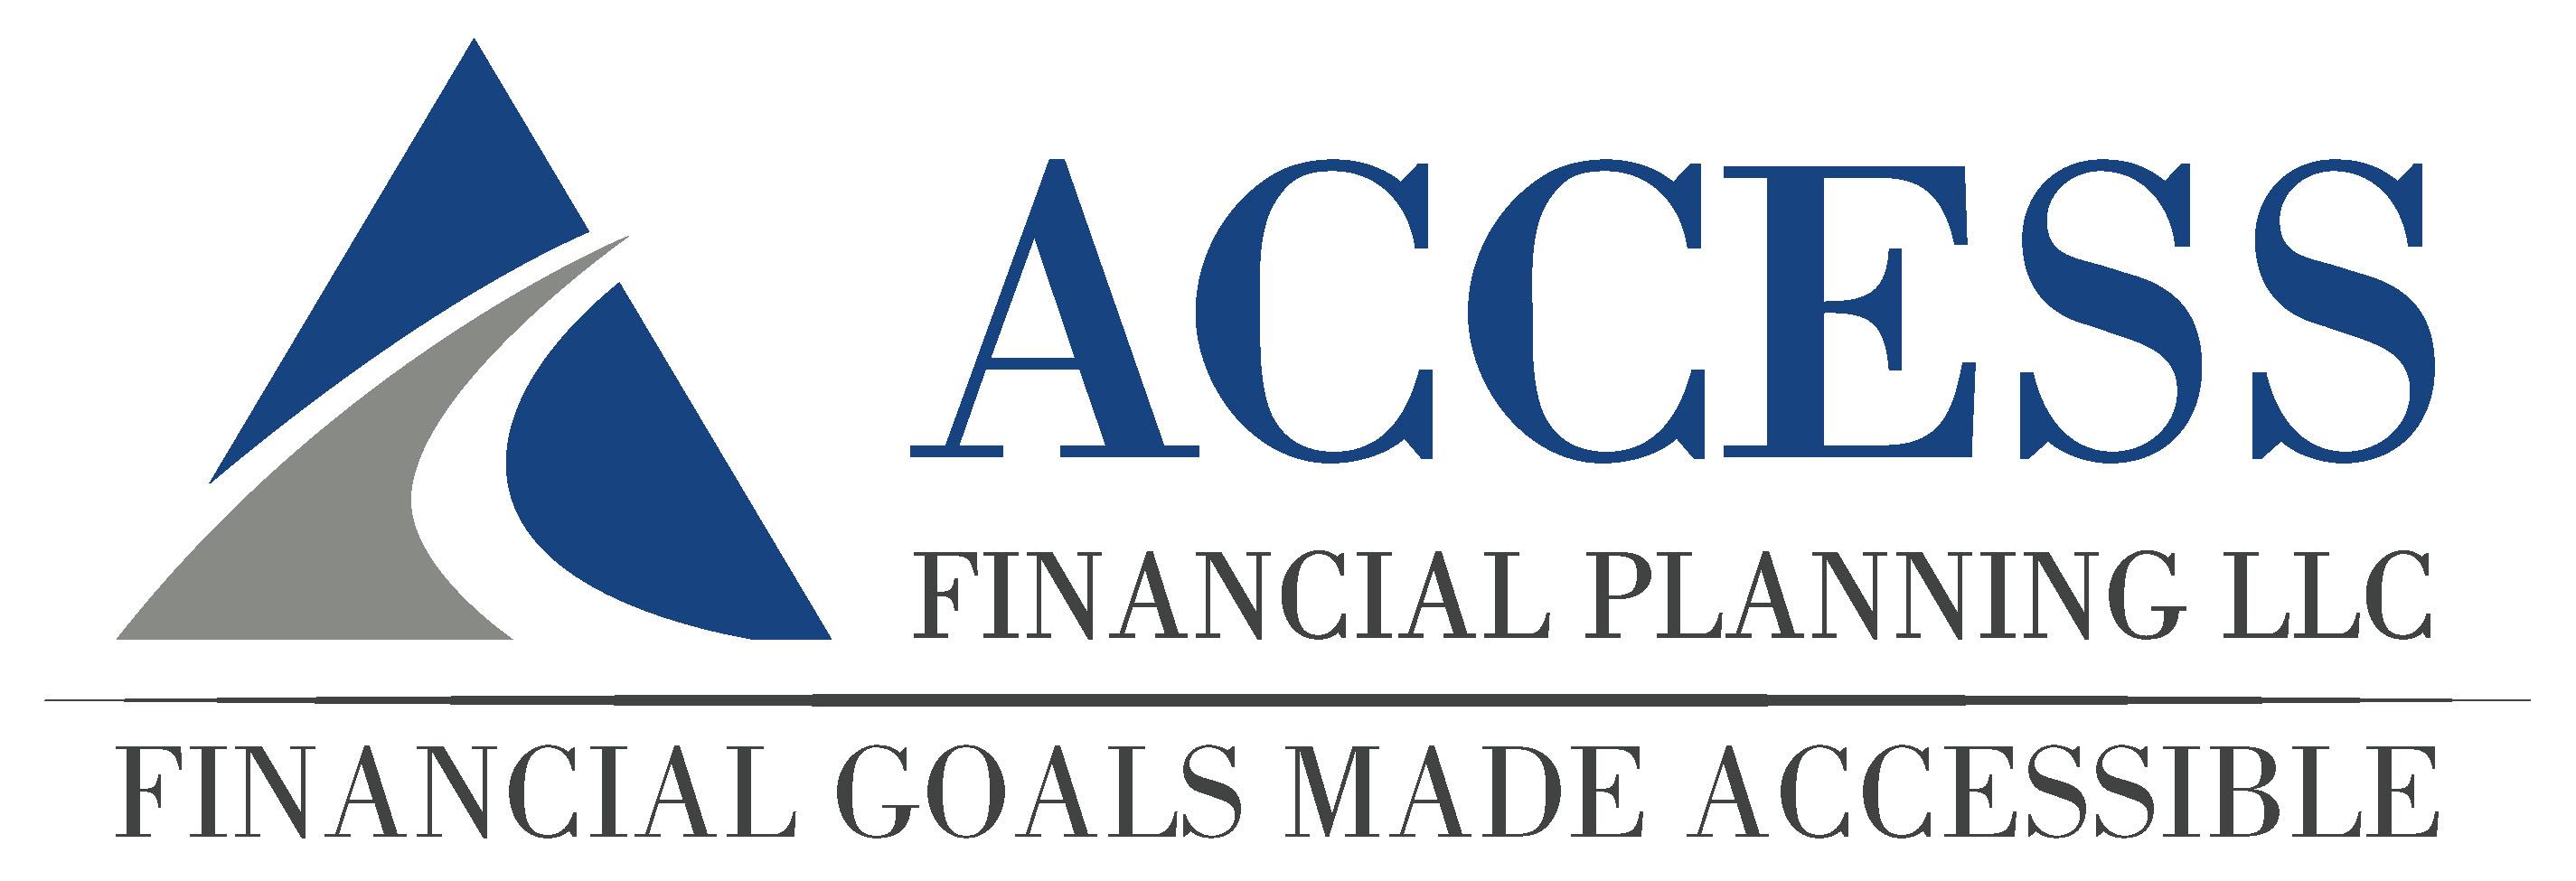 Access Financial Planning, LLC